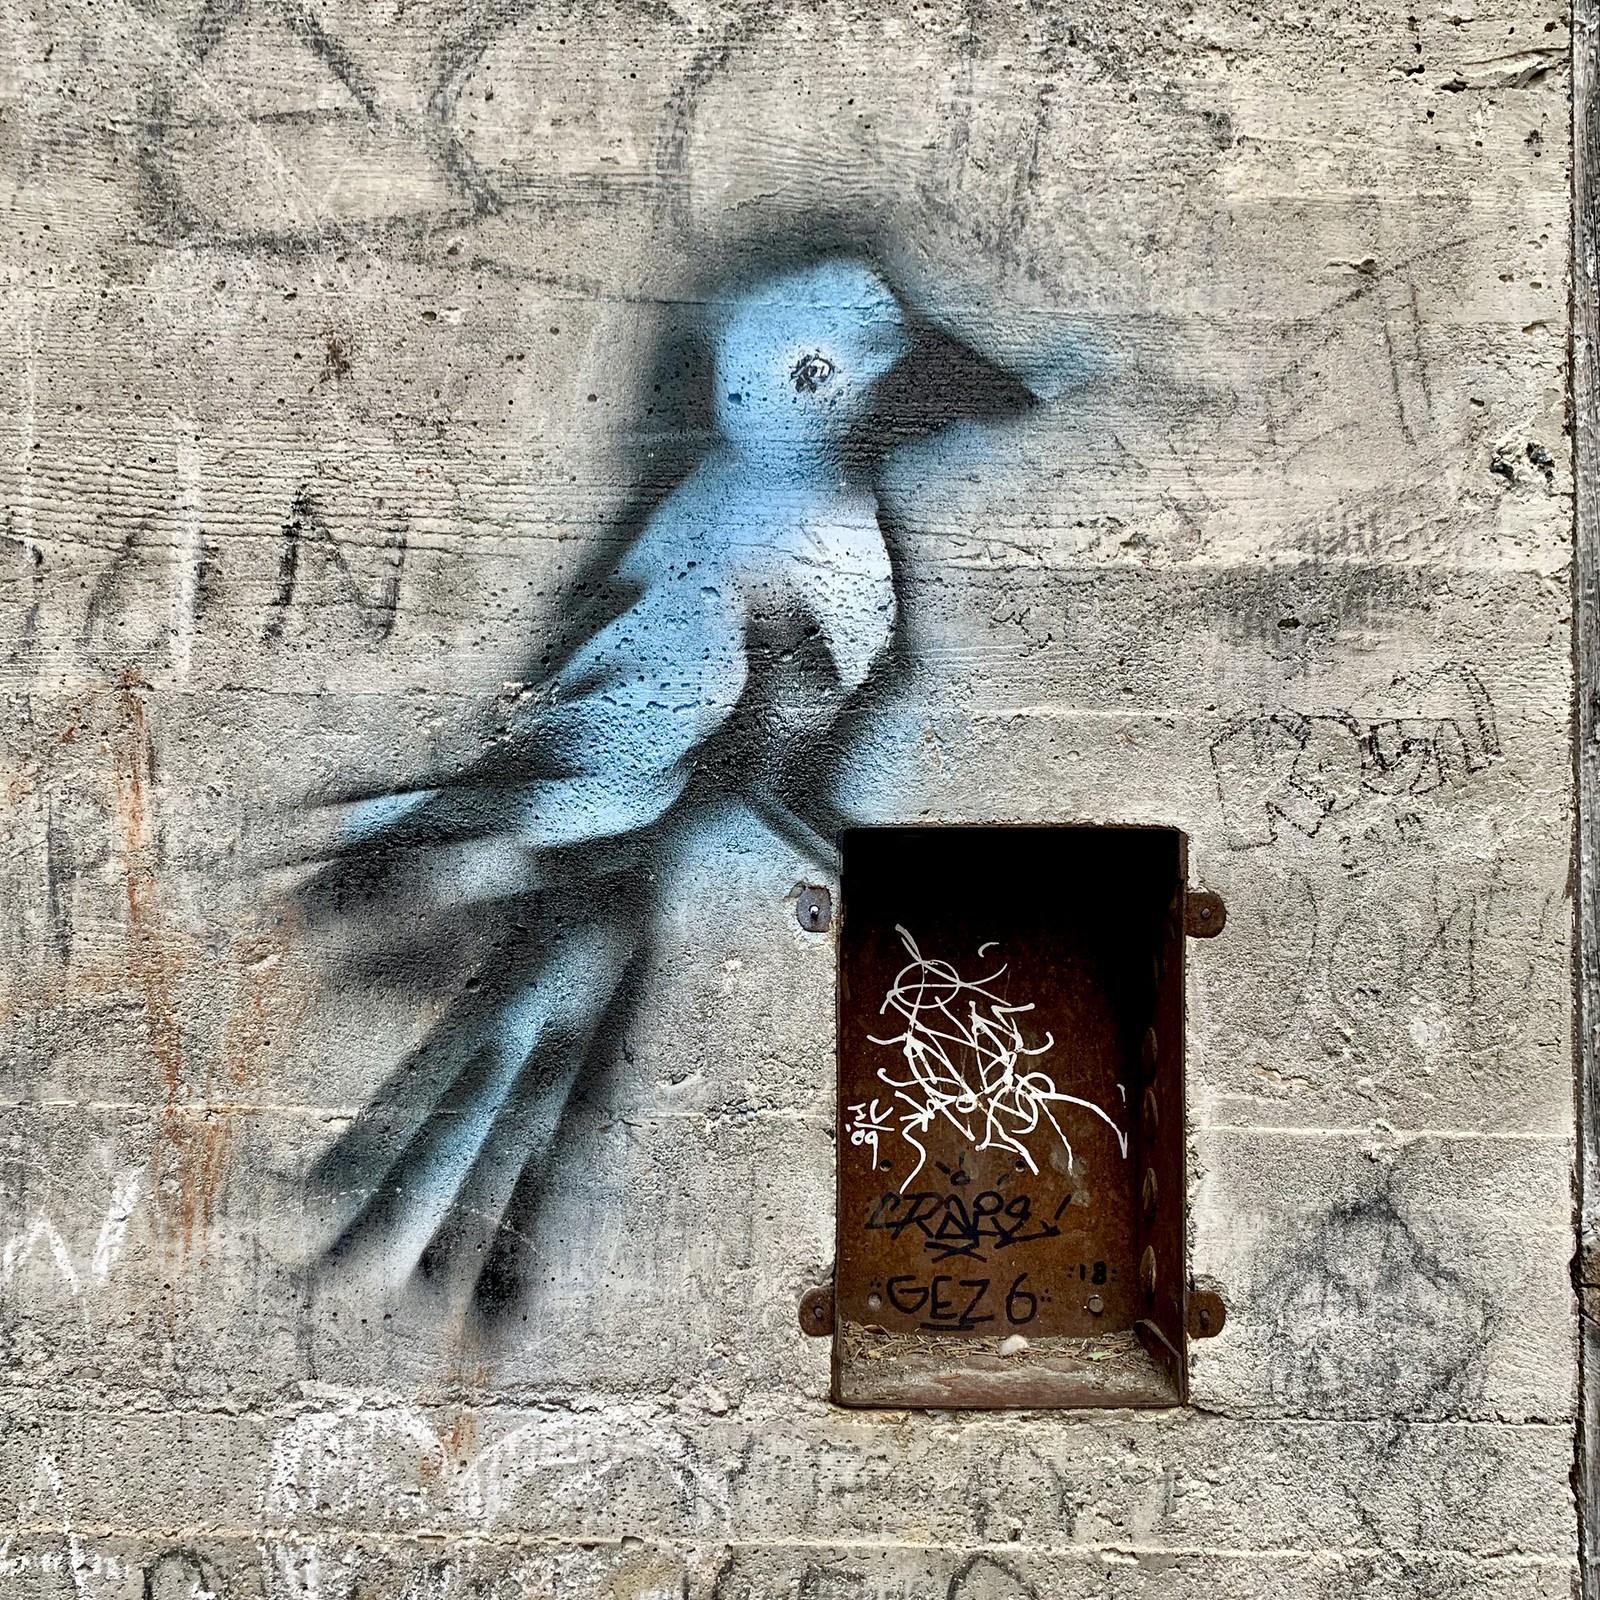 Wayward blue jay